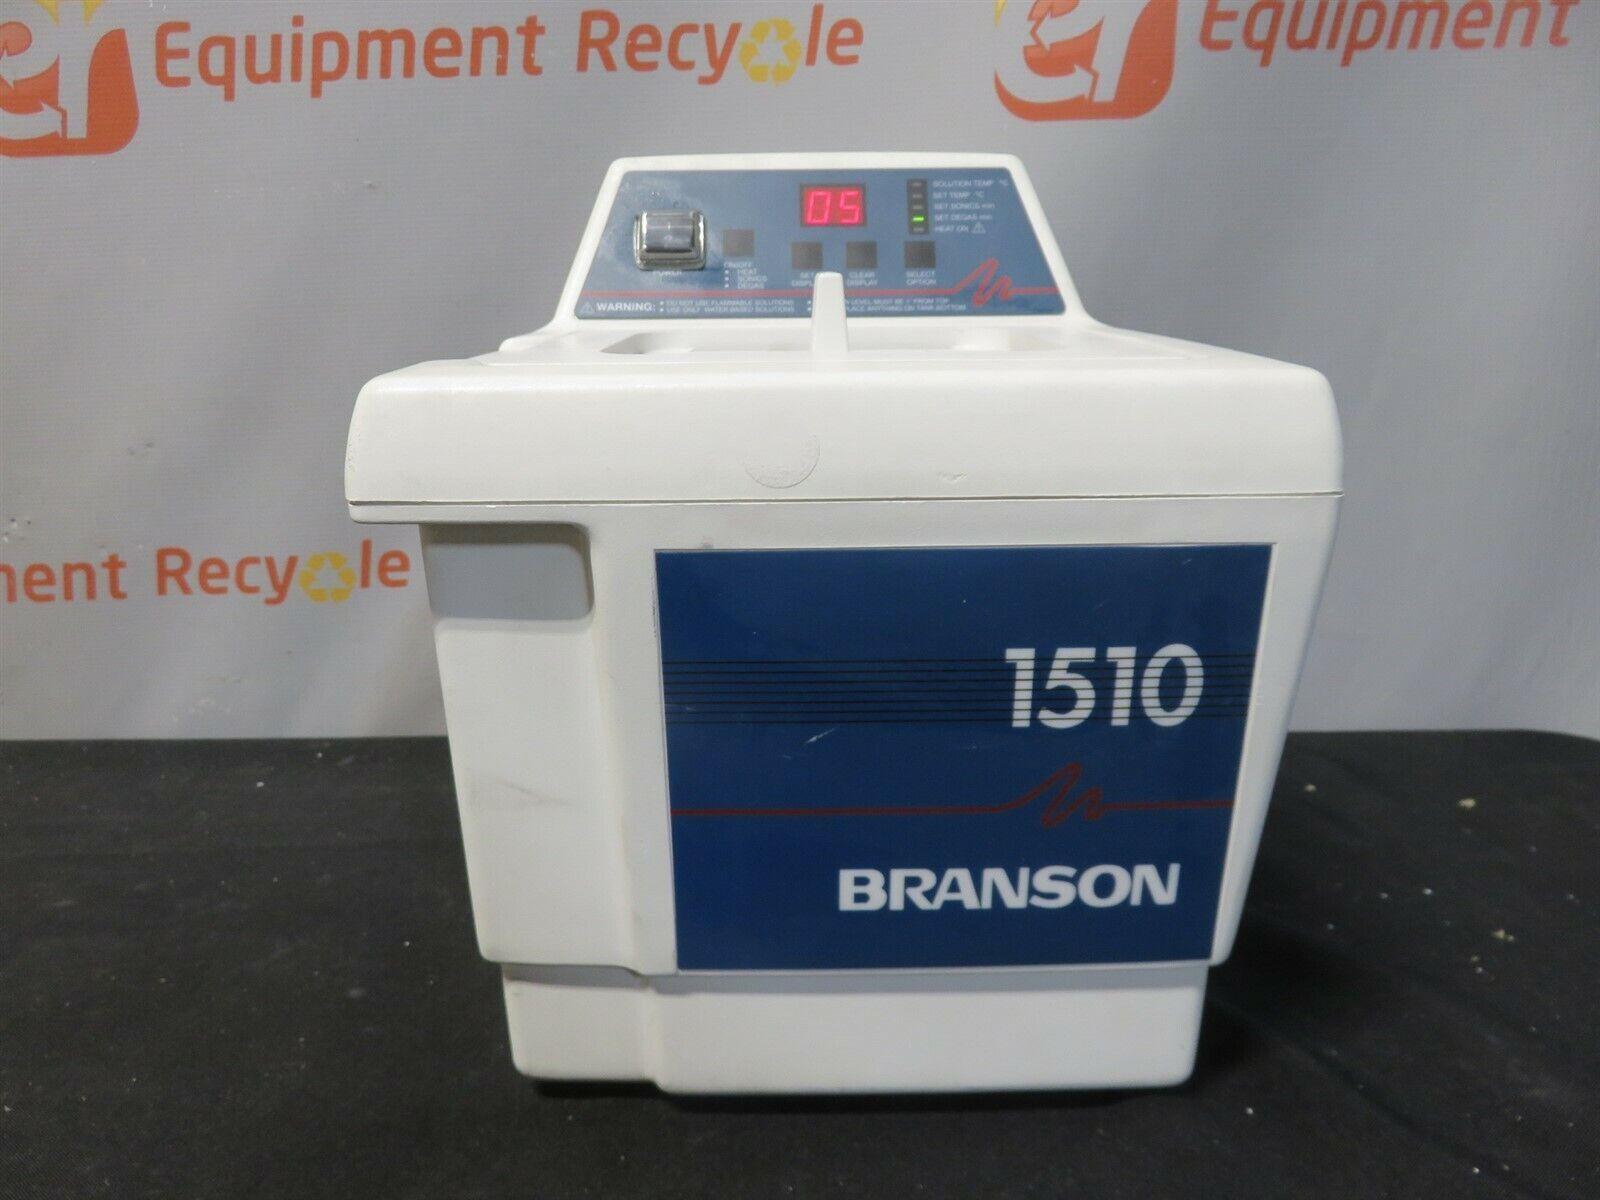 Branson Bransonic 1510 1510R-DTH Ultrasonic Cleaner Water Bath 1/2 Gallon